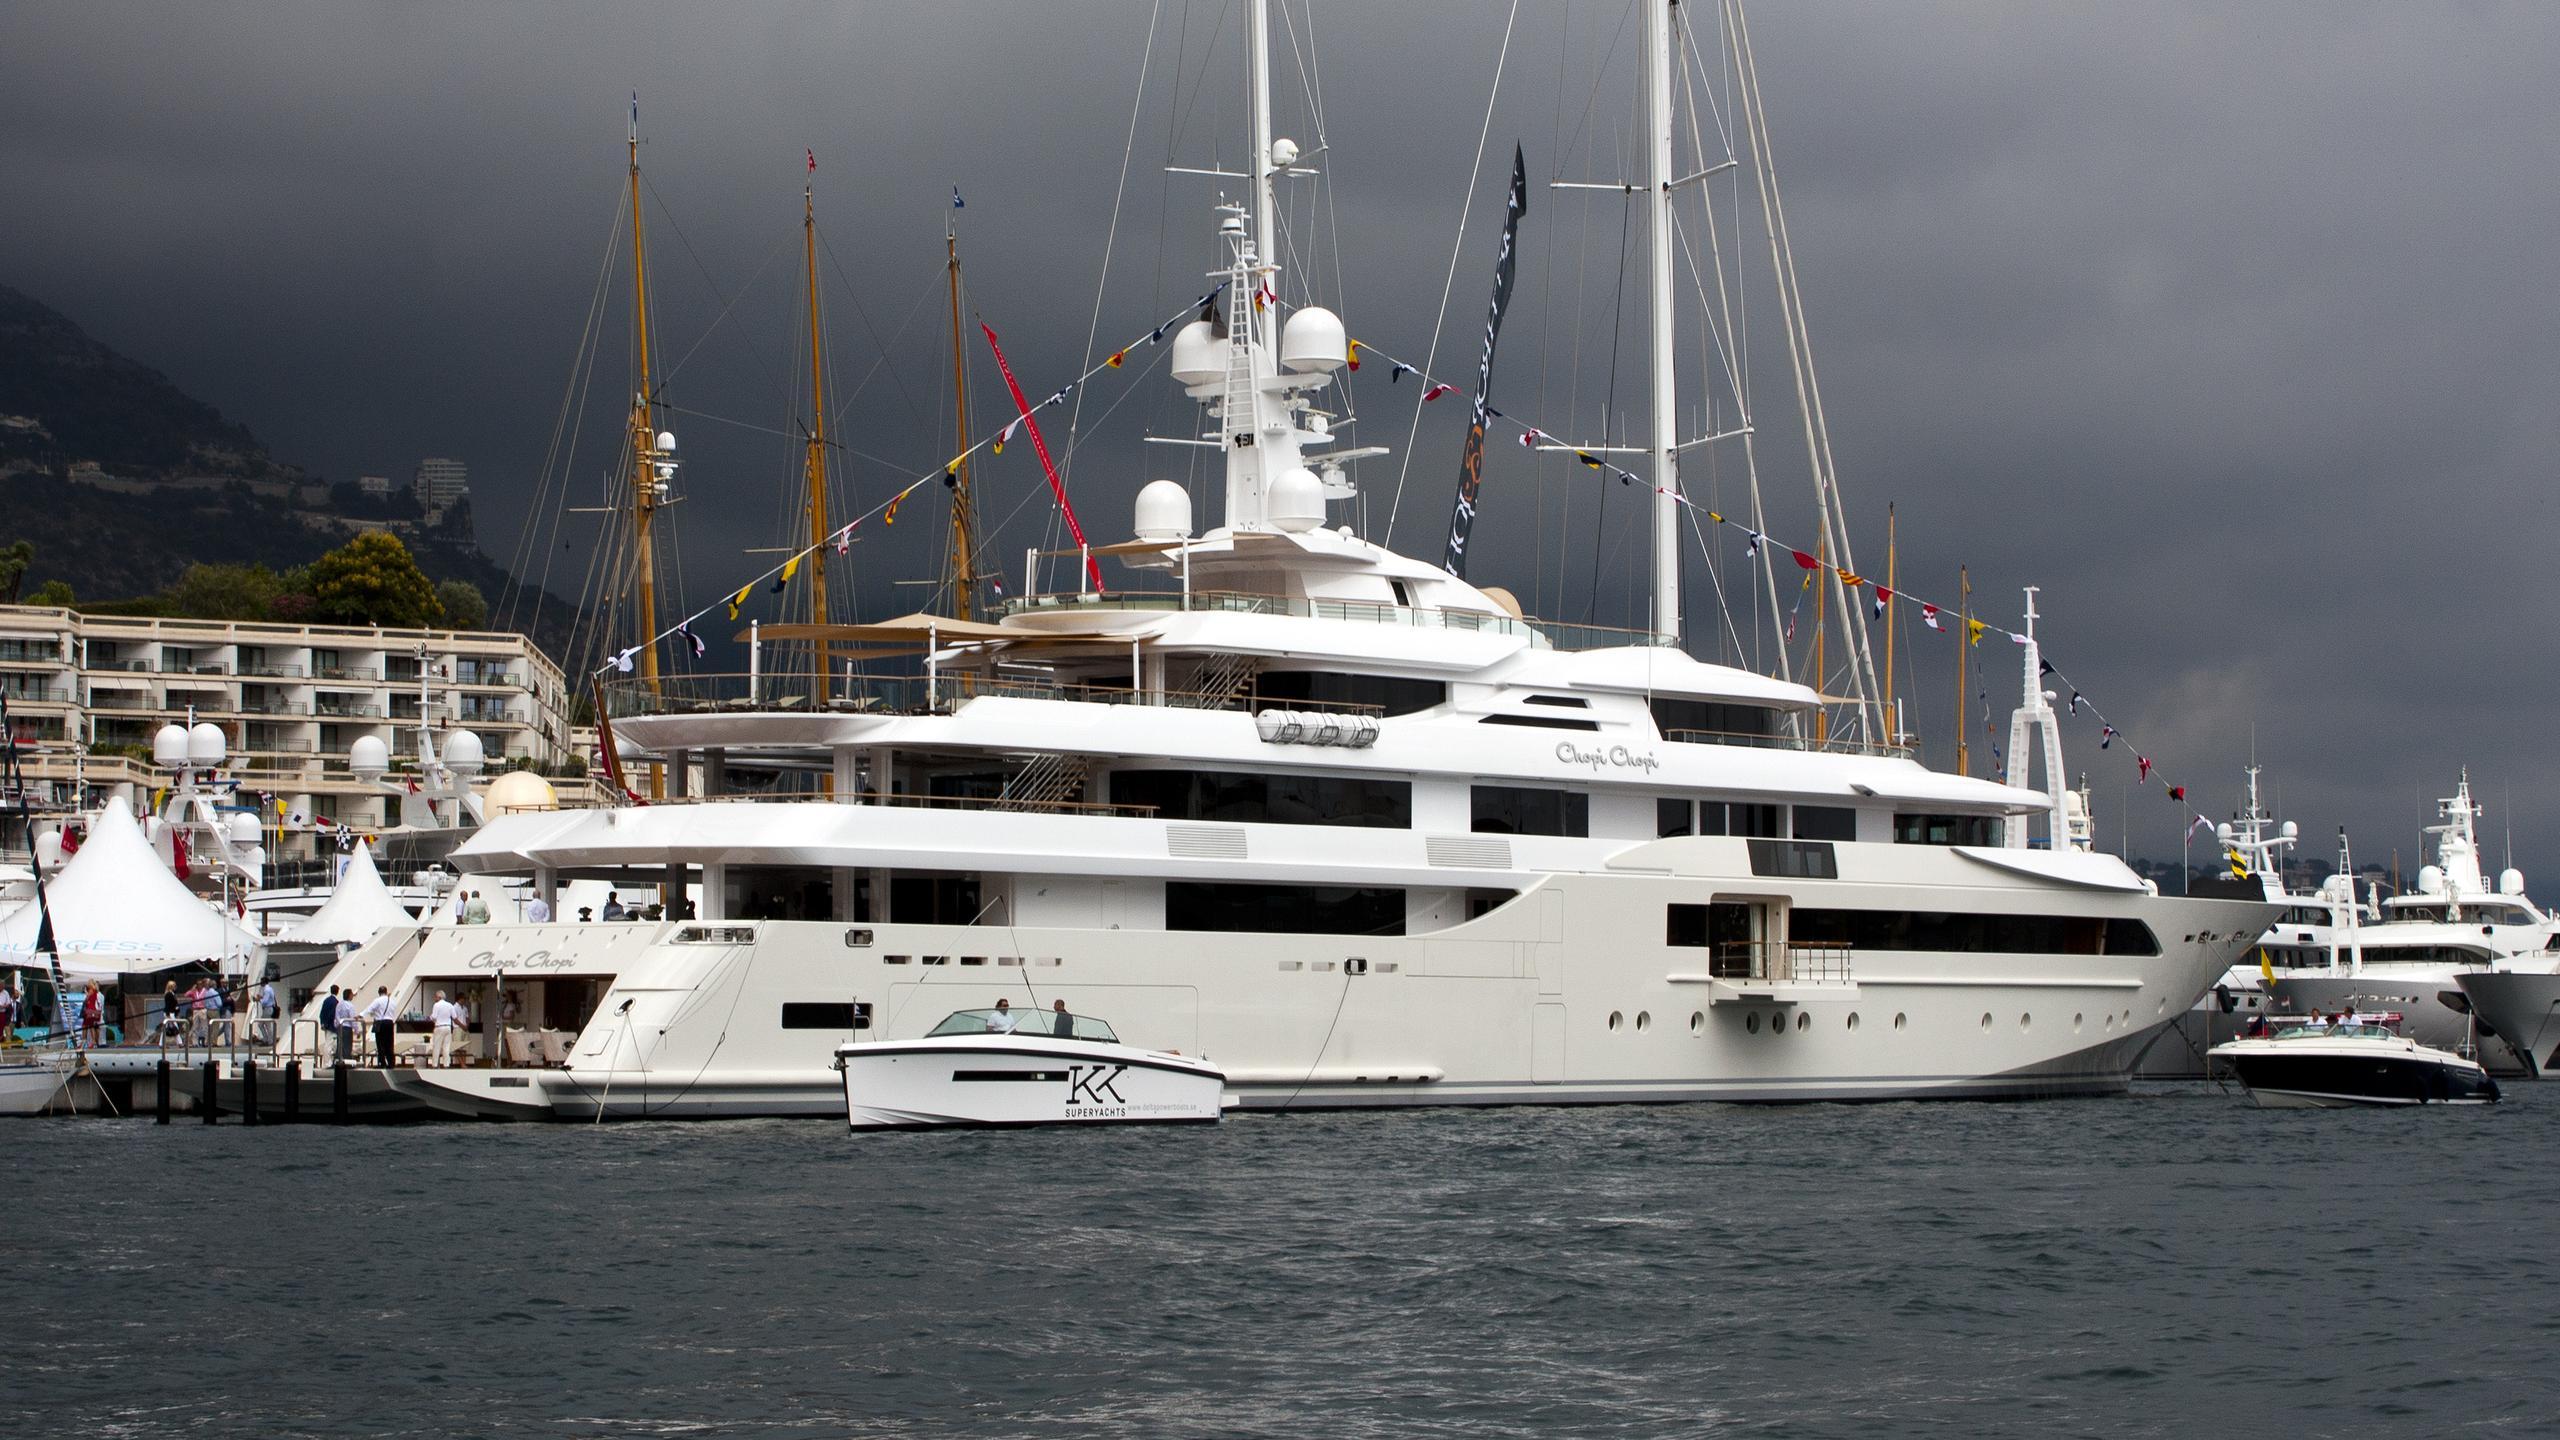 chopi-chopi-motor-yacht-crn-2013-80m-moored-half-profile